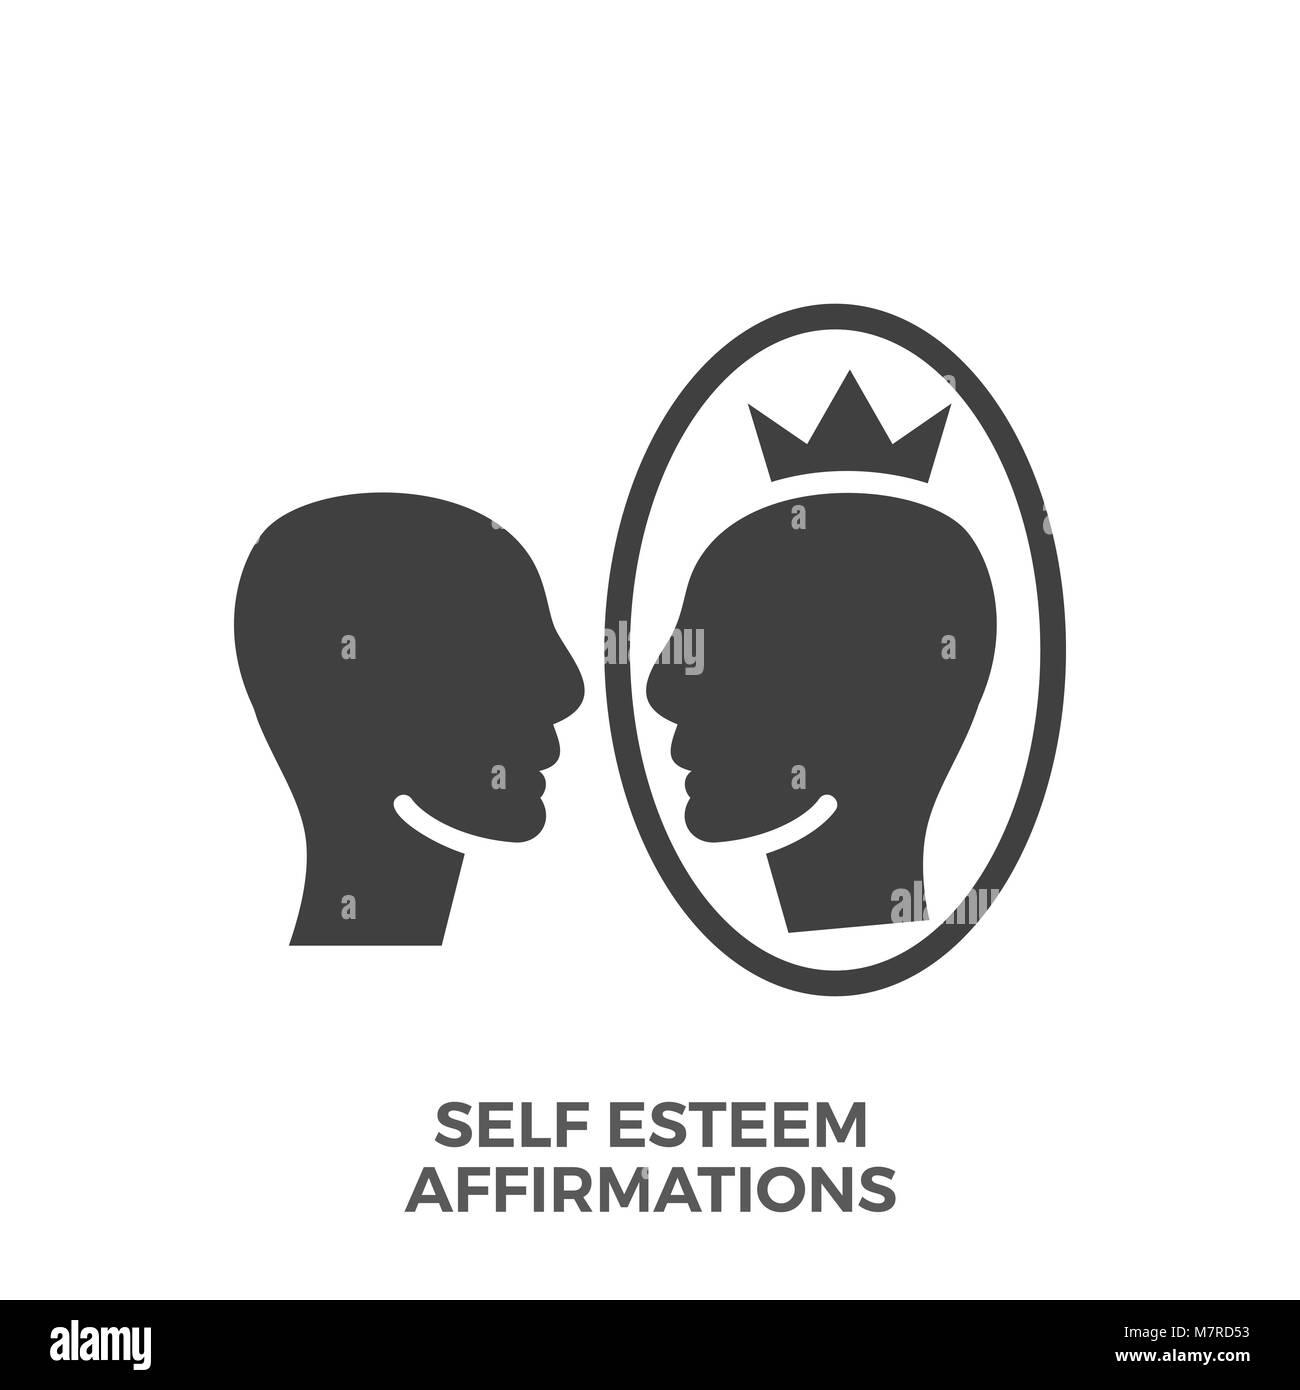 Self Esteem Affirmations Glyph Vector Icon. - Stock Image